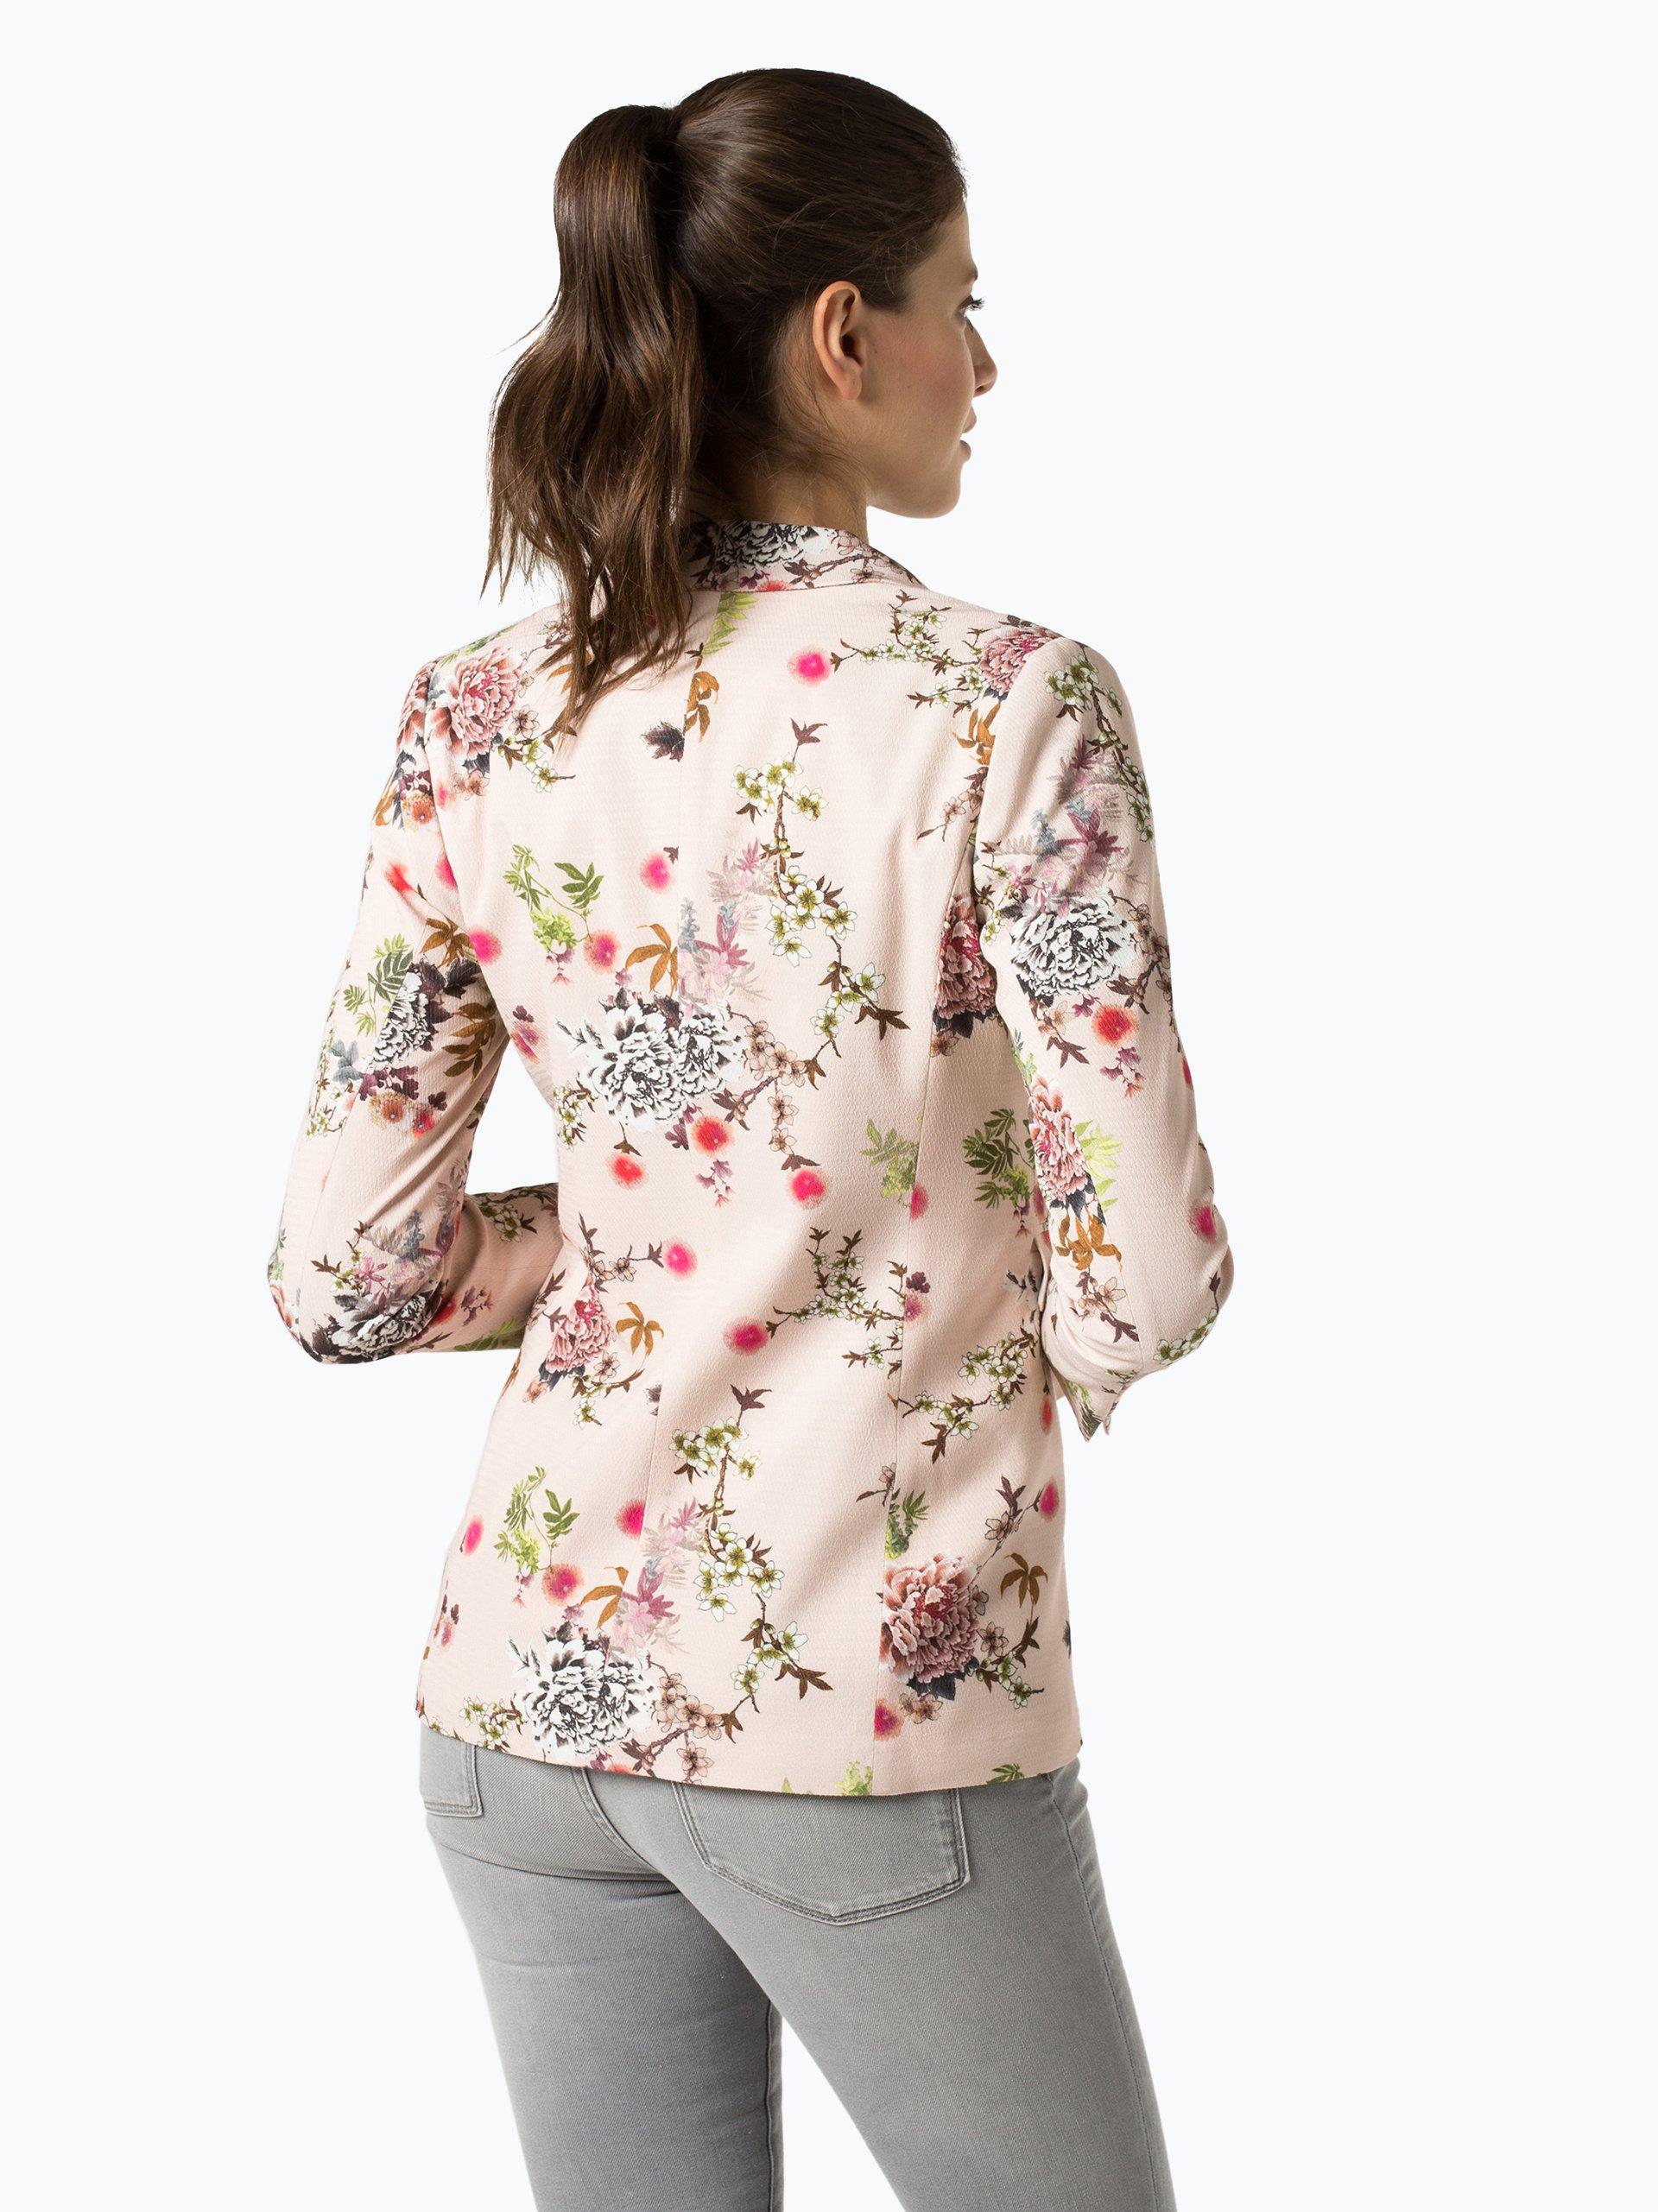 taifun damen blazer rosa altrosa gemustert online kaufen vangraaf com. Black Bedroom Furniture Sets. Home Design Ideas